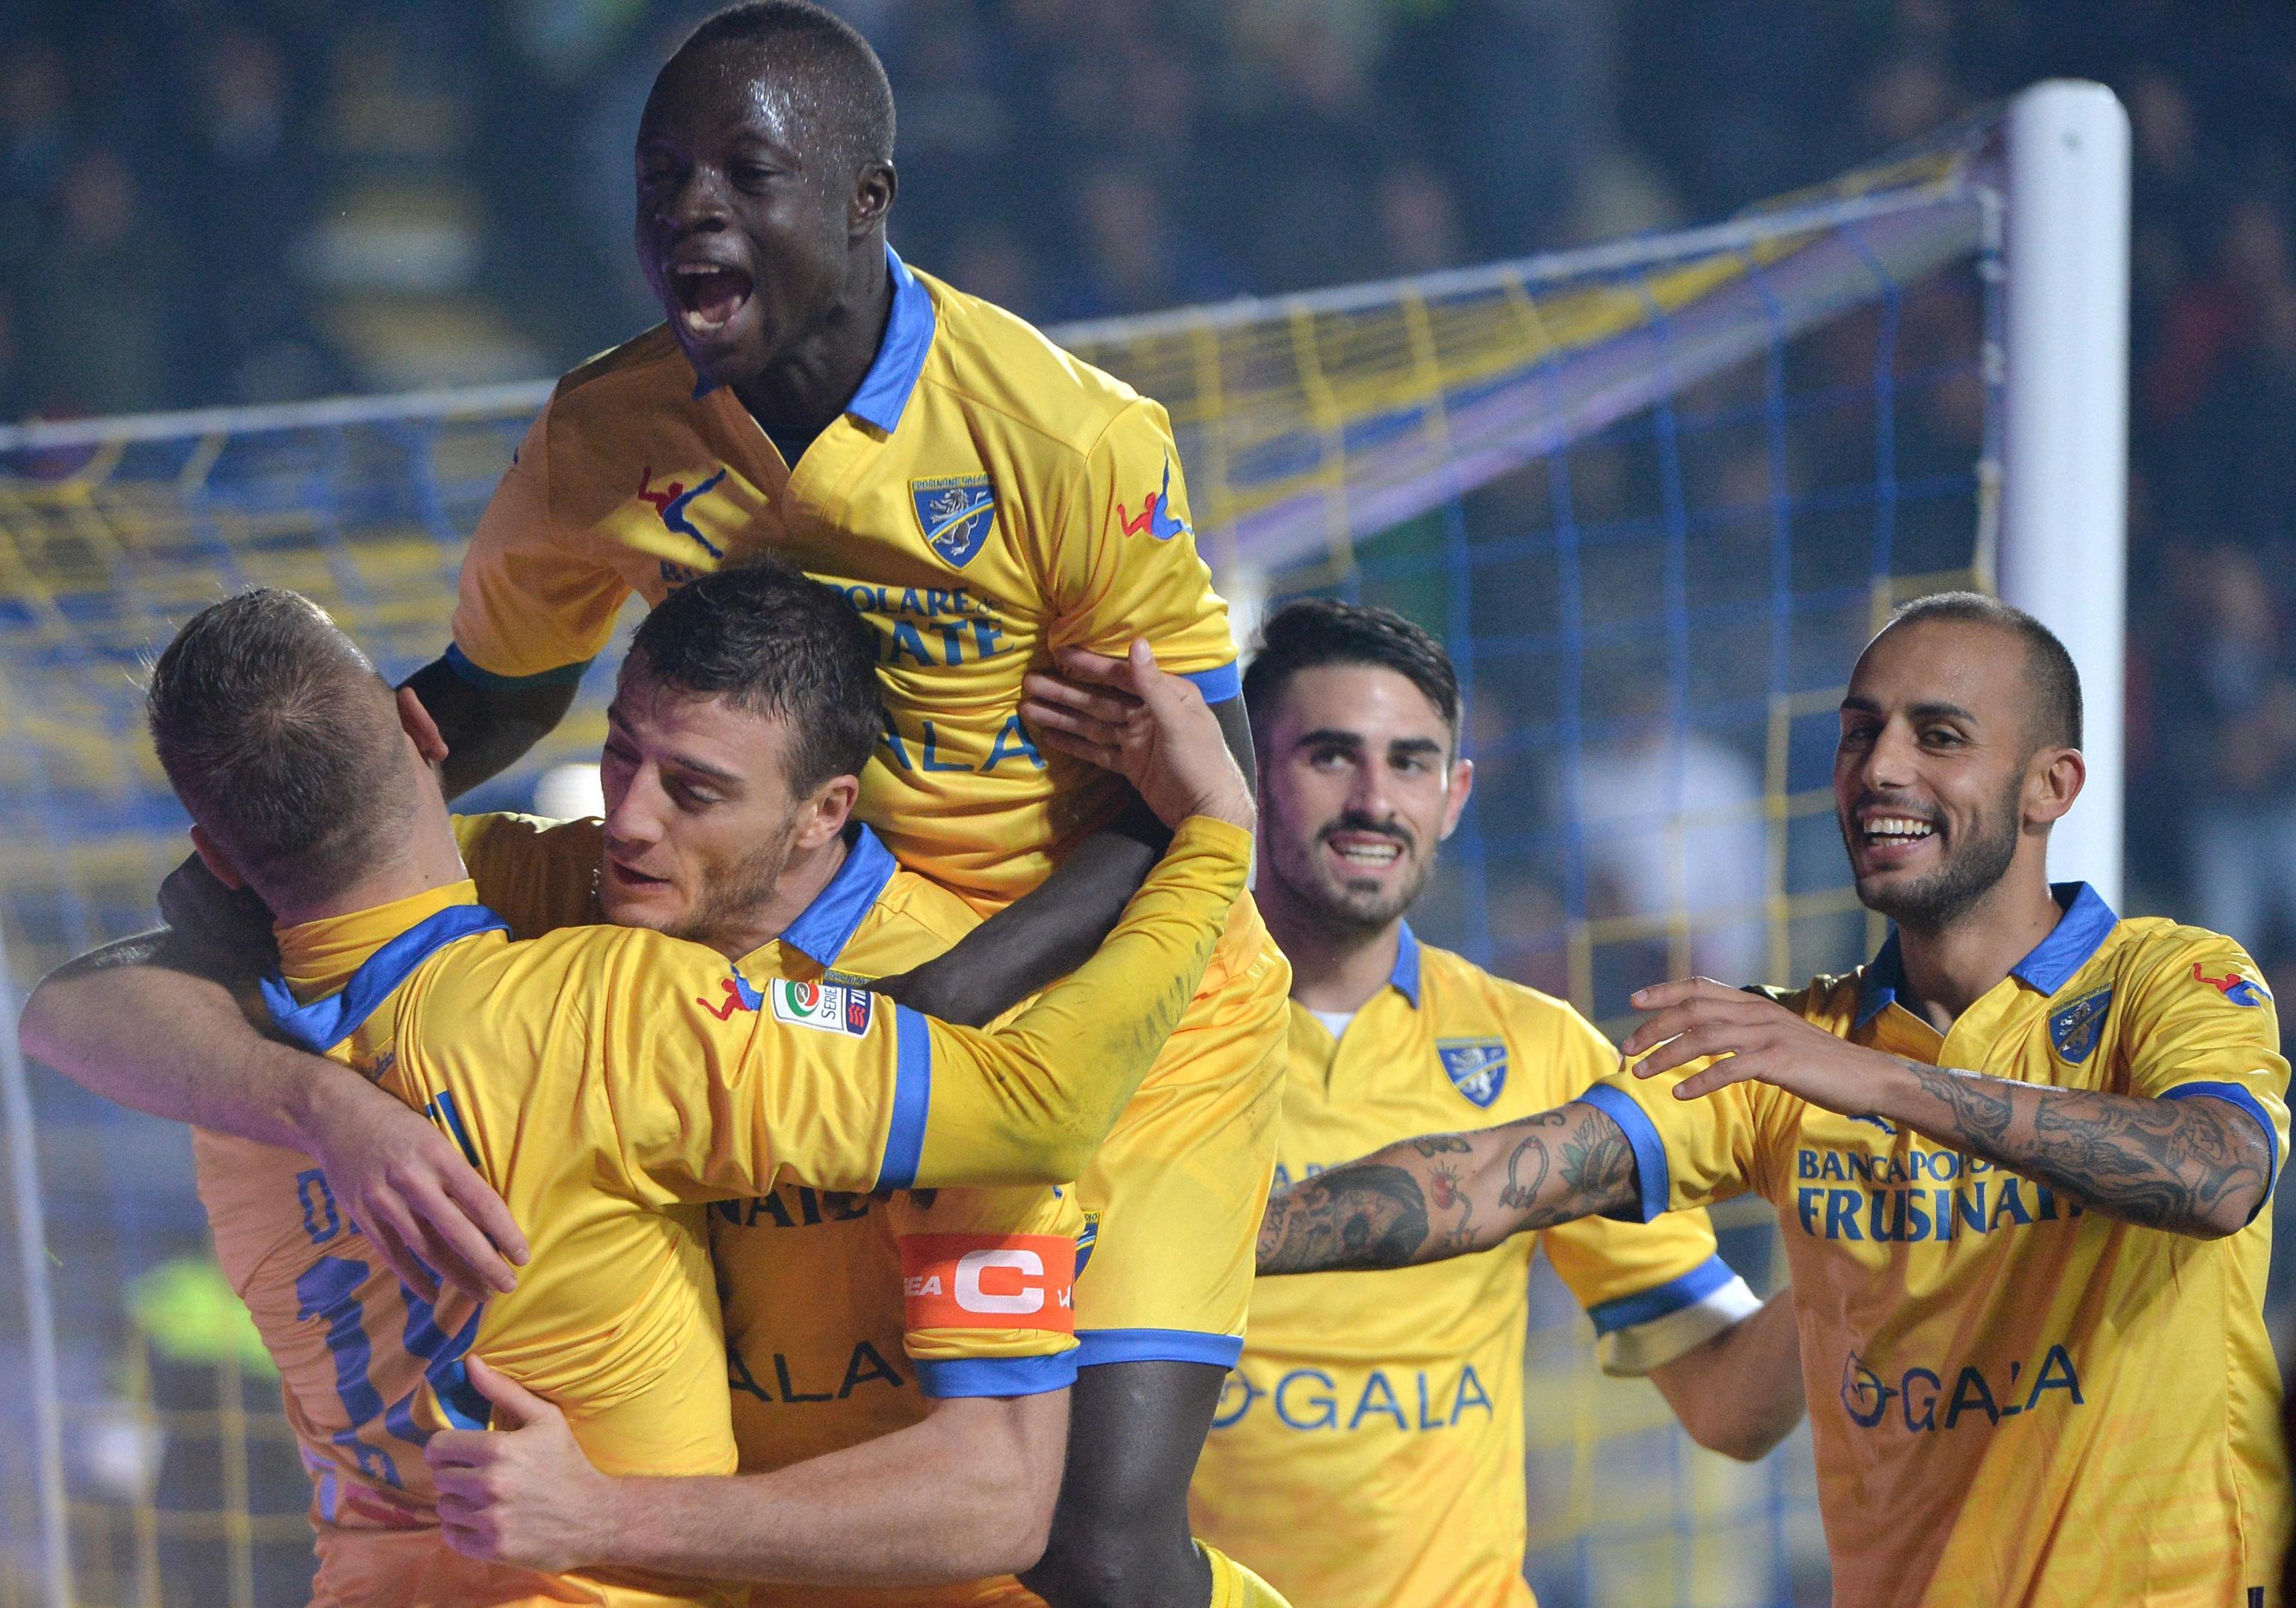 Frosinone-Benevento